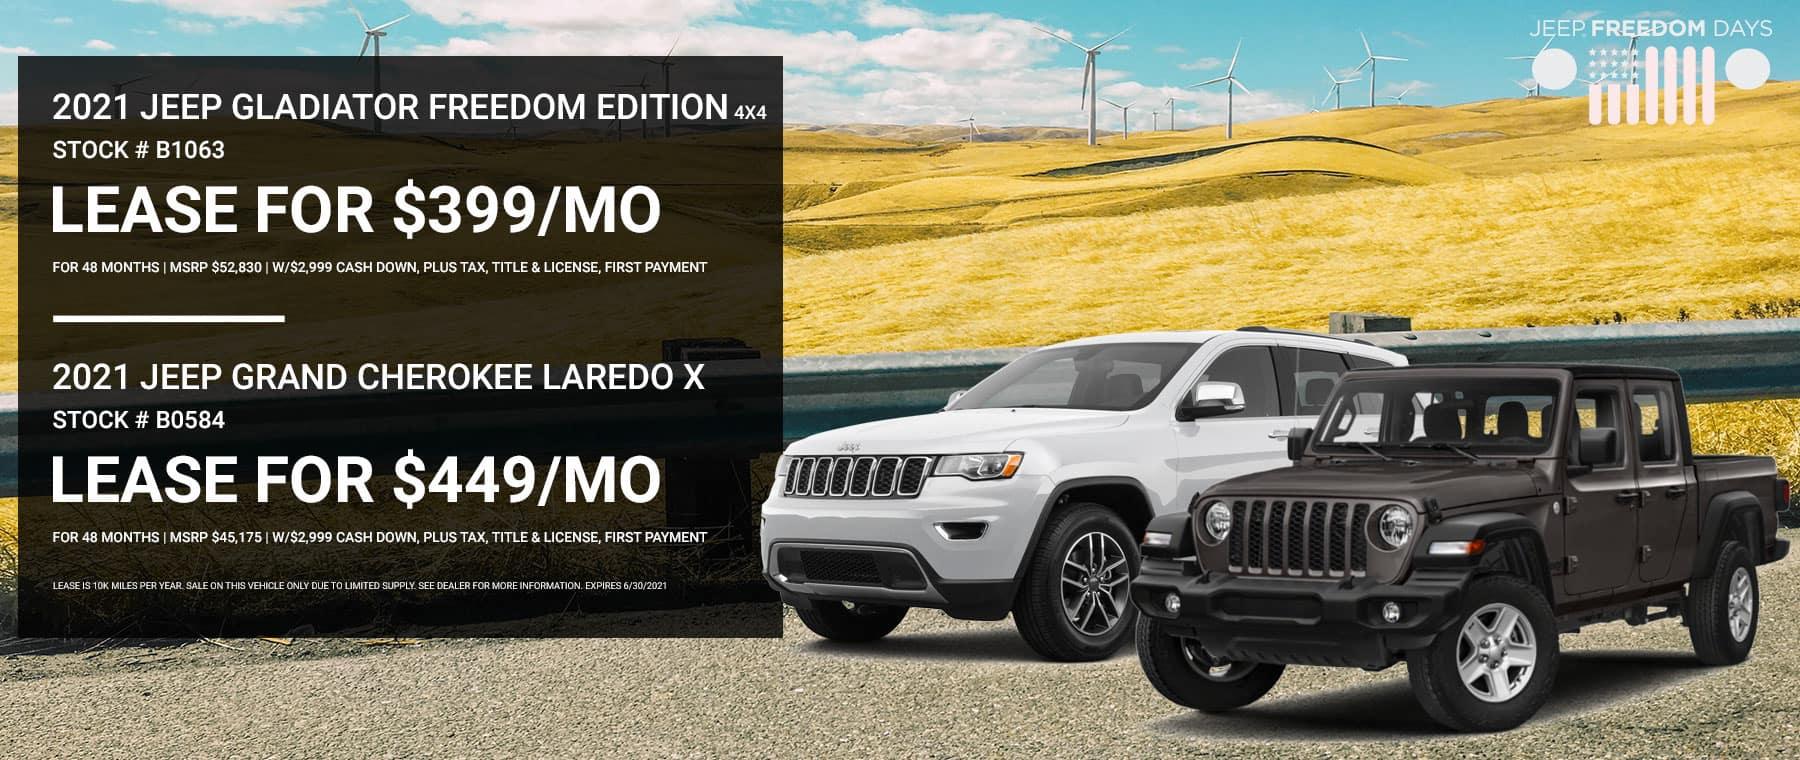 2021 Jeep Grand Cherokee Laredo X Stock # B0584   2021 Jeep Gladiator Freedom Edition 4x4 Stock # B1063